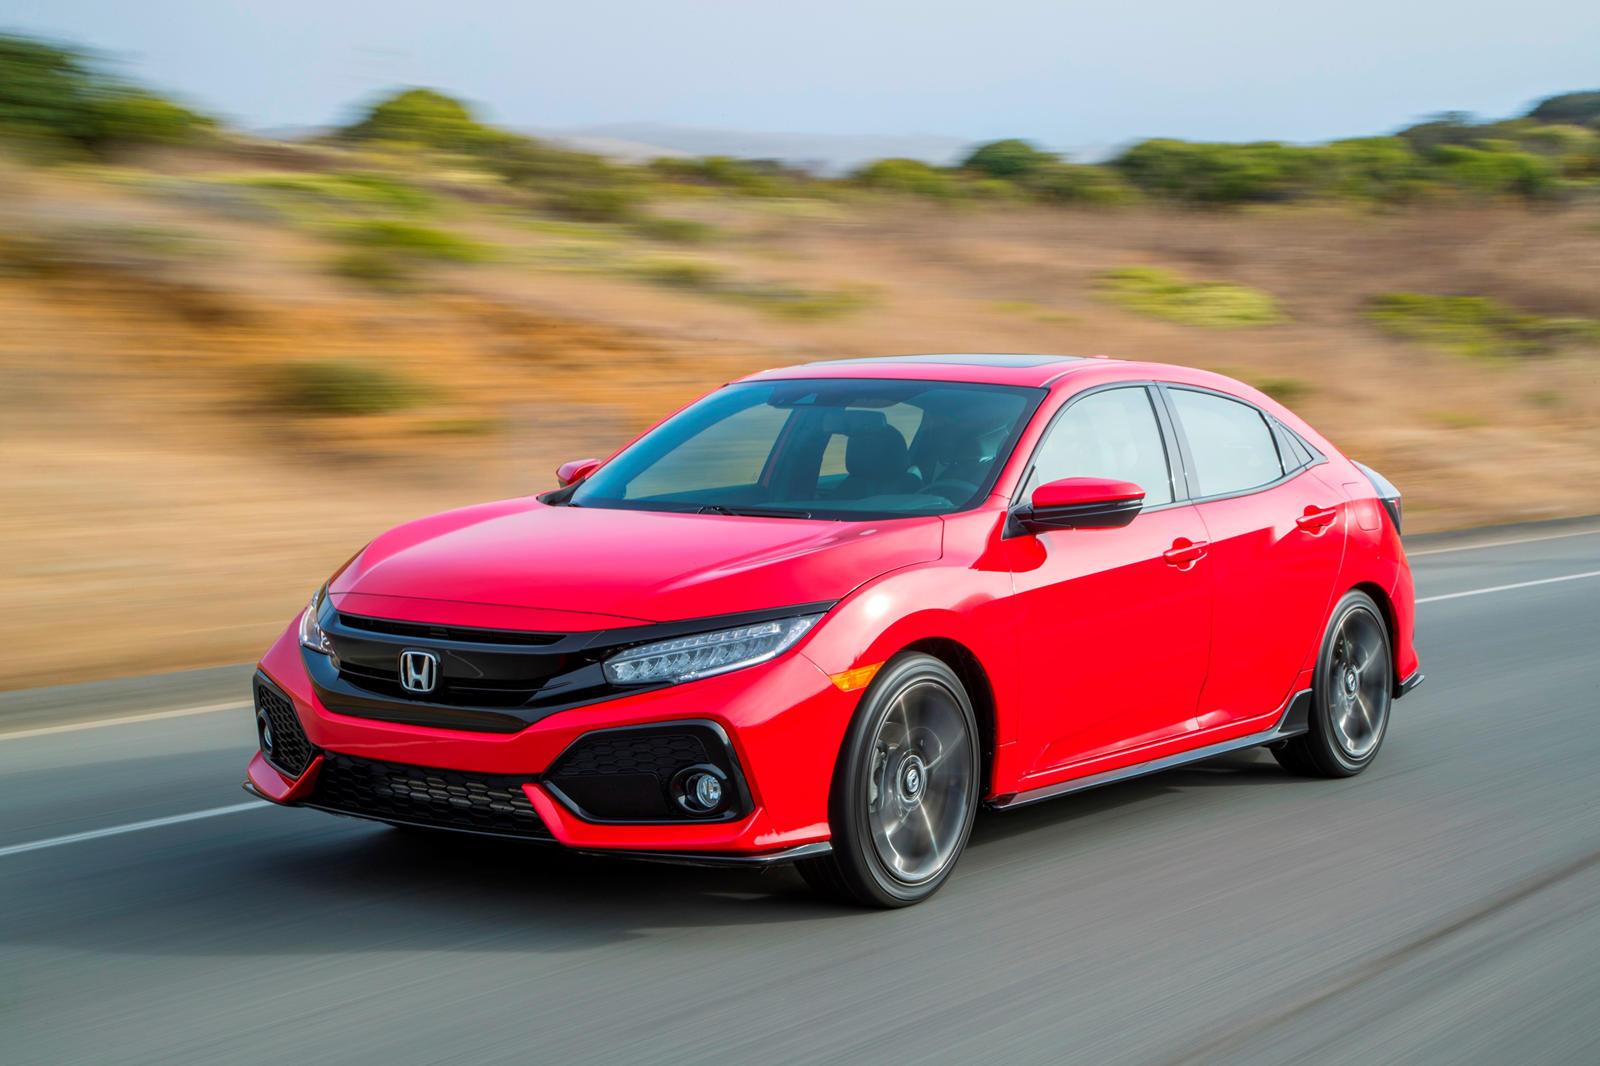 2020 Honda Civic Hatchback Trims Specs Carbuzz